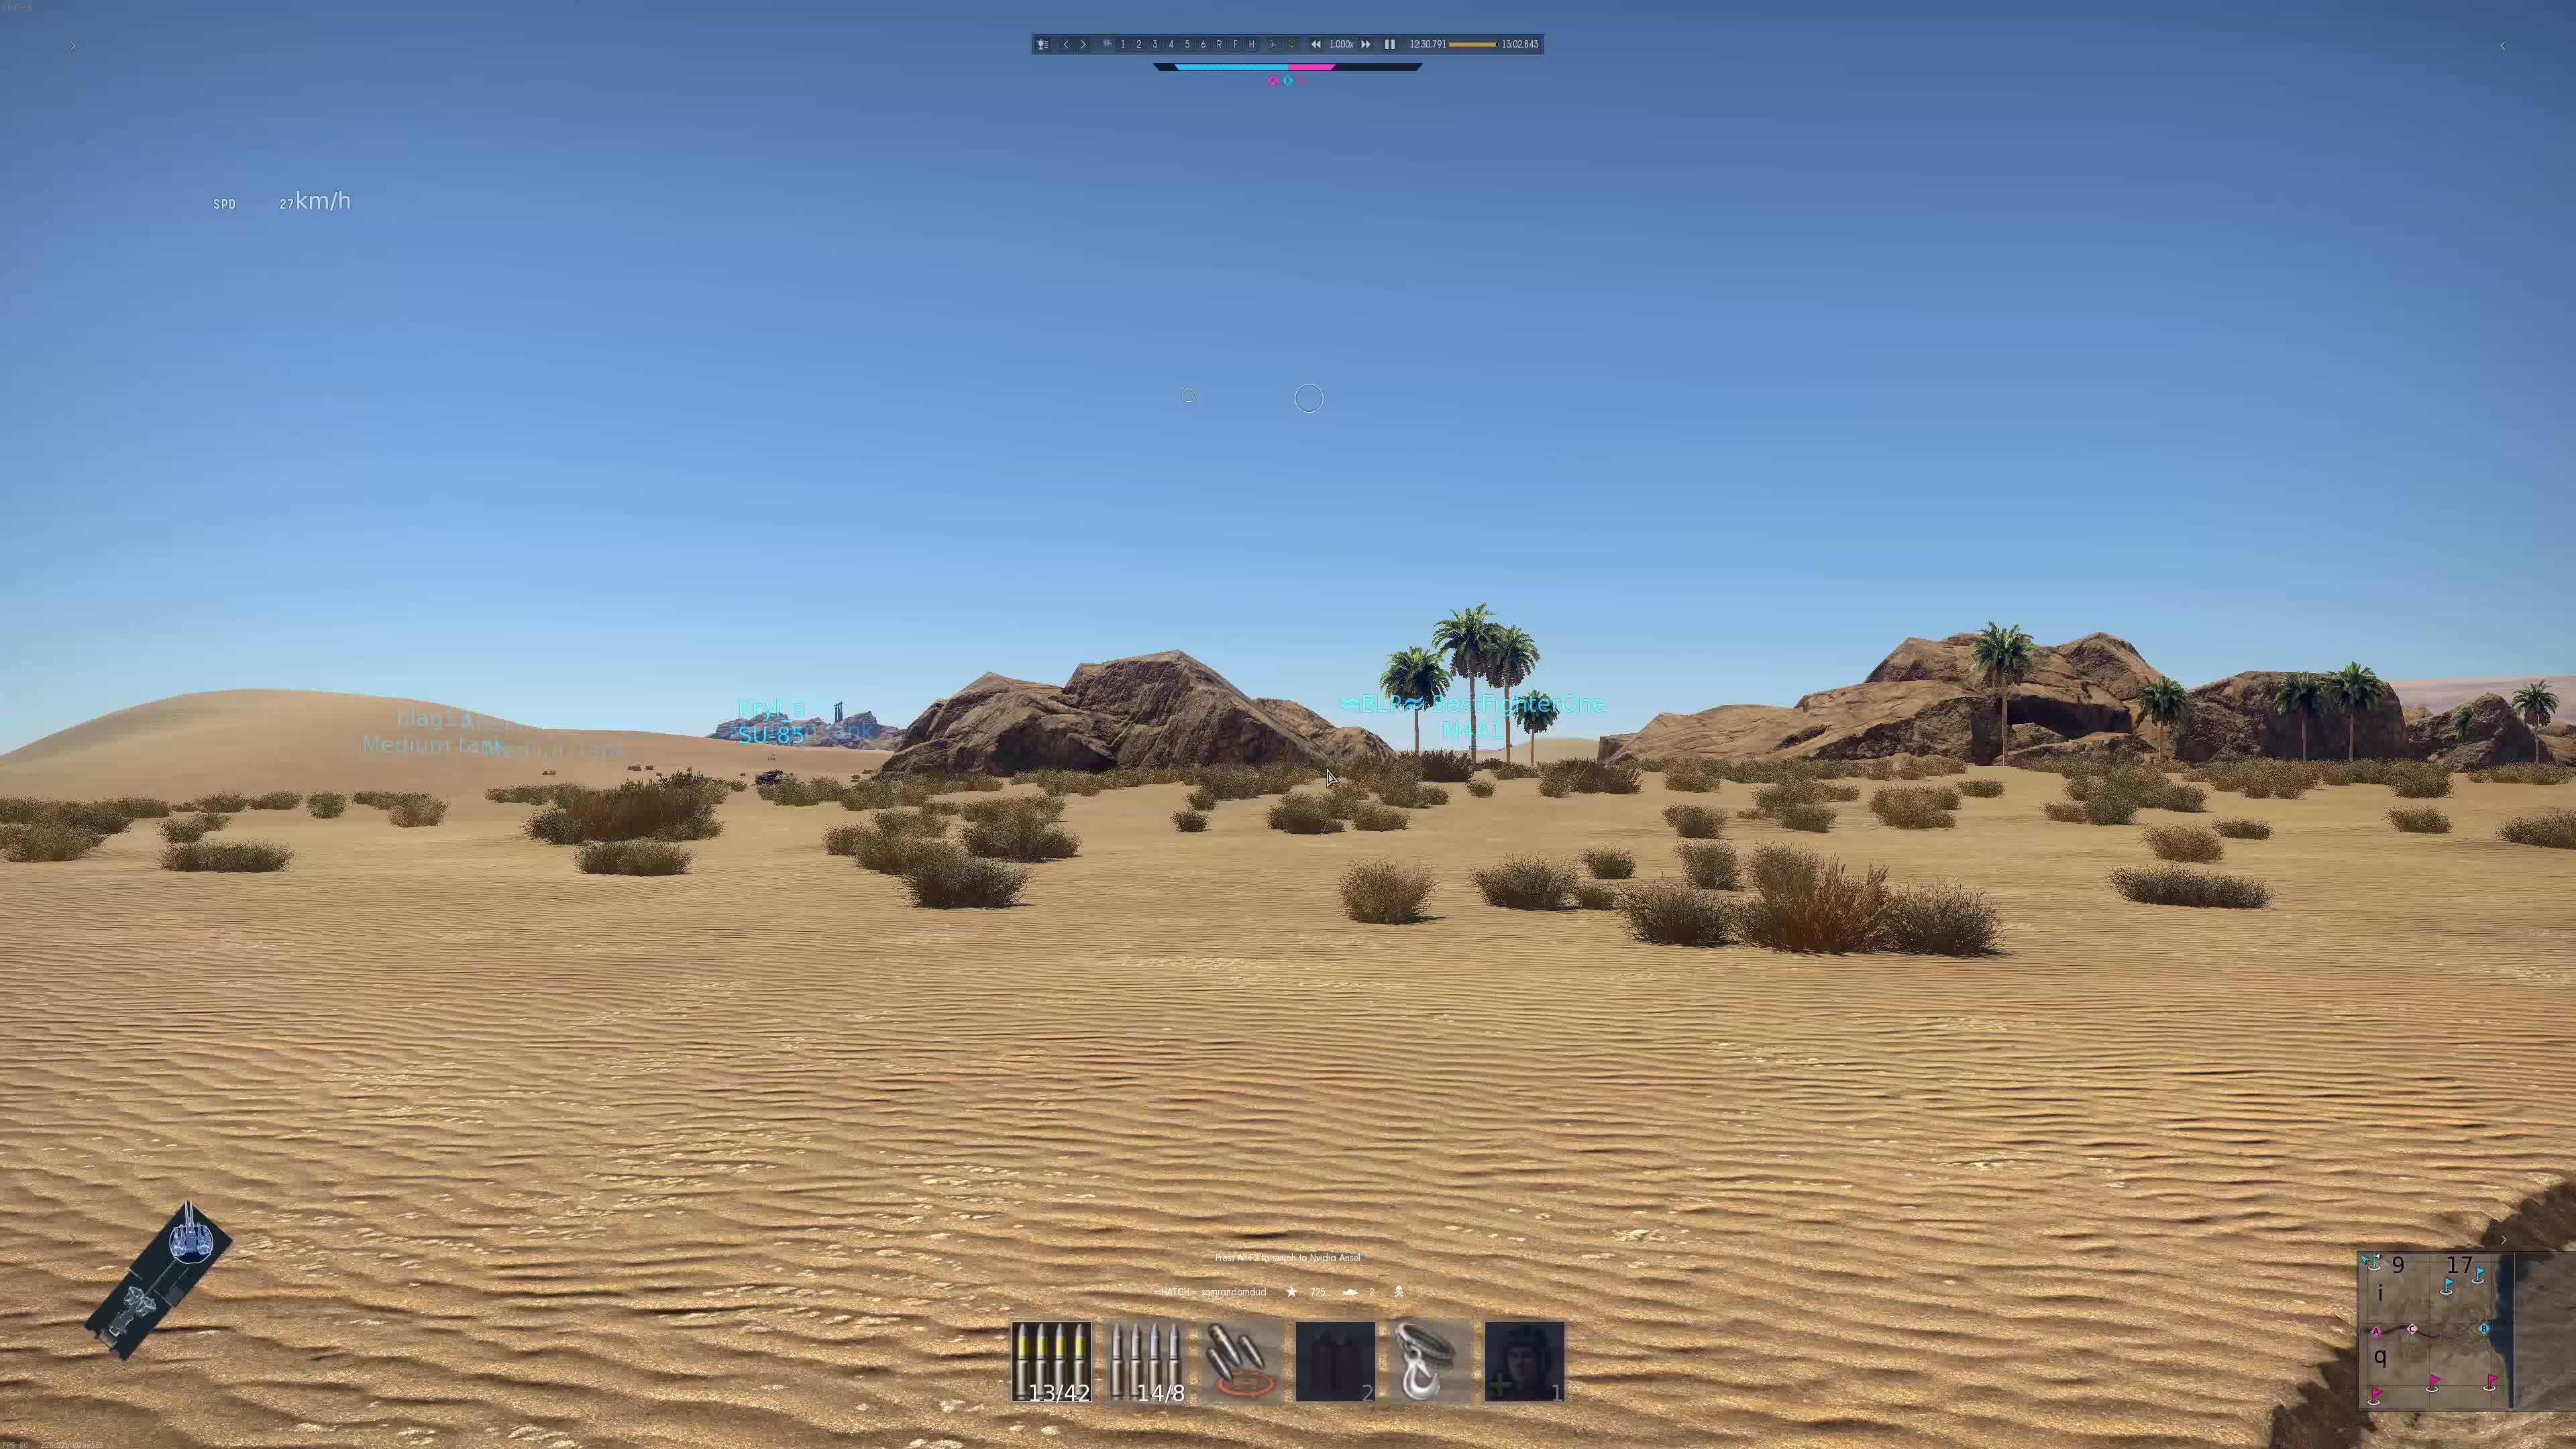 notonestepbackcomrade, warthunder, Warthunder - Tank simulator - Point of No Return GIFs